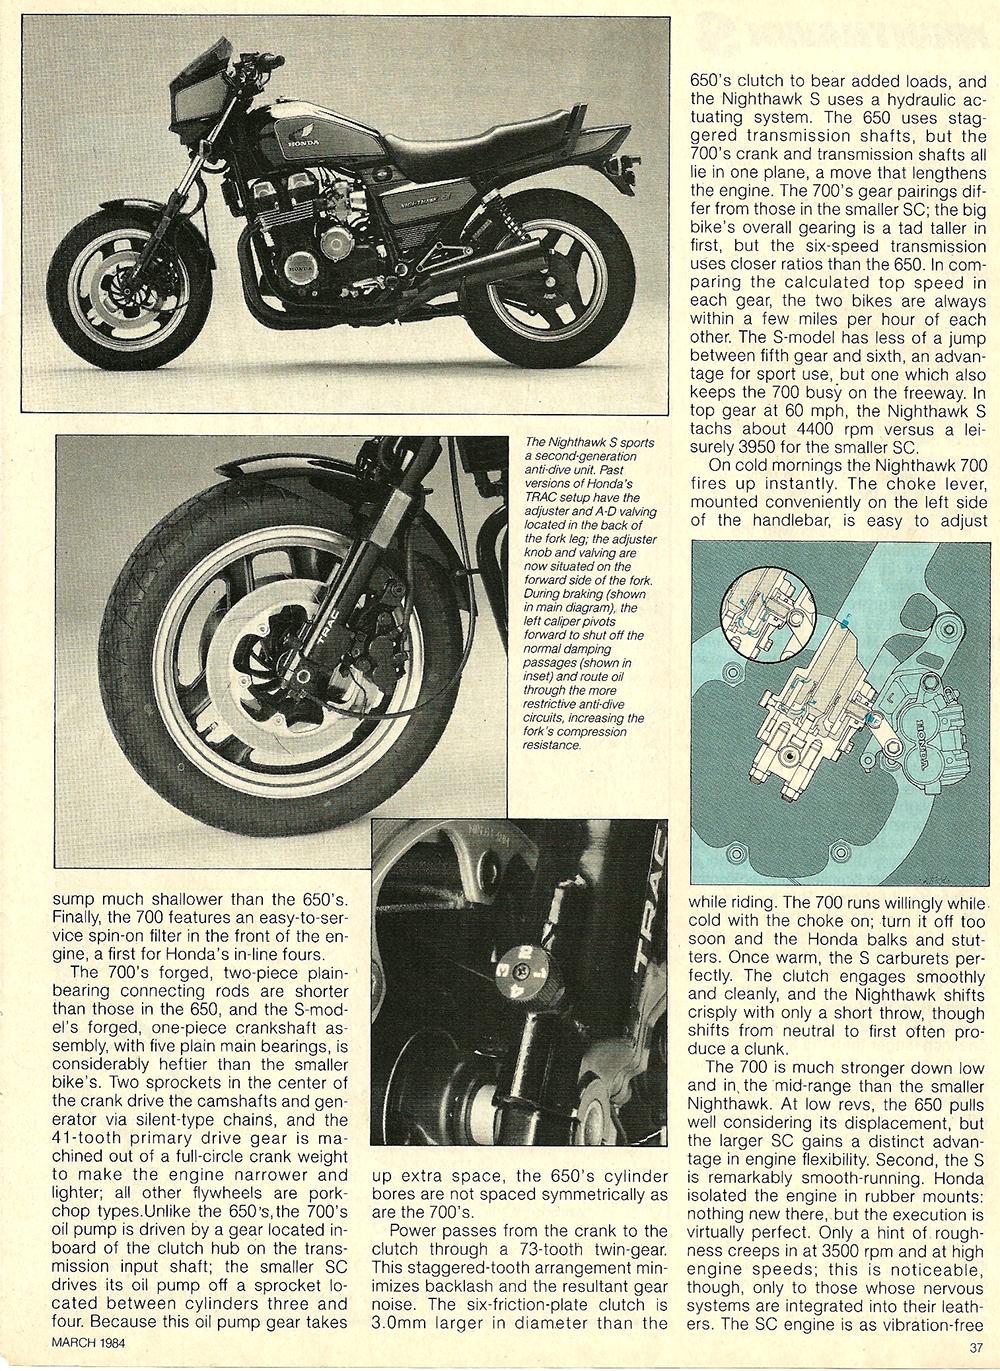 1984 Honda CB700SC Nighthawk S road test 6.jpg